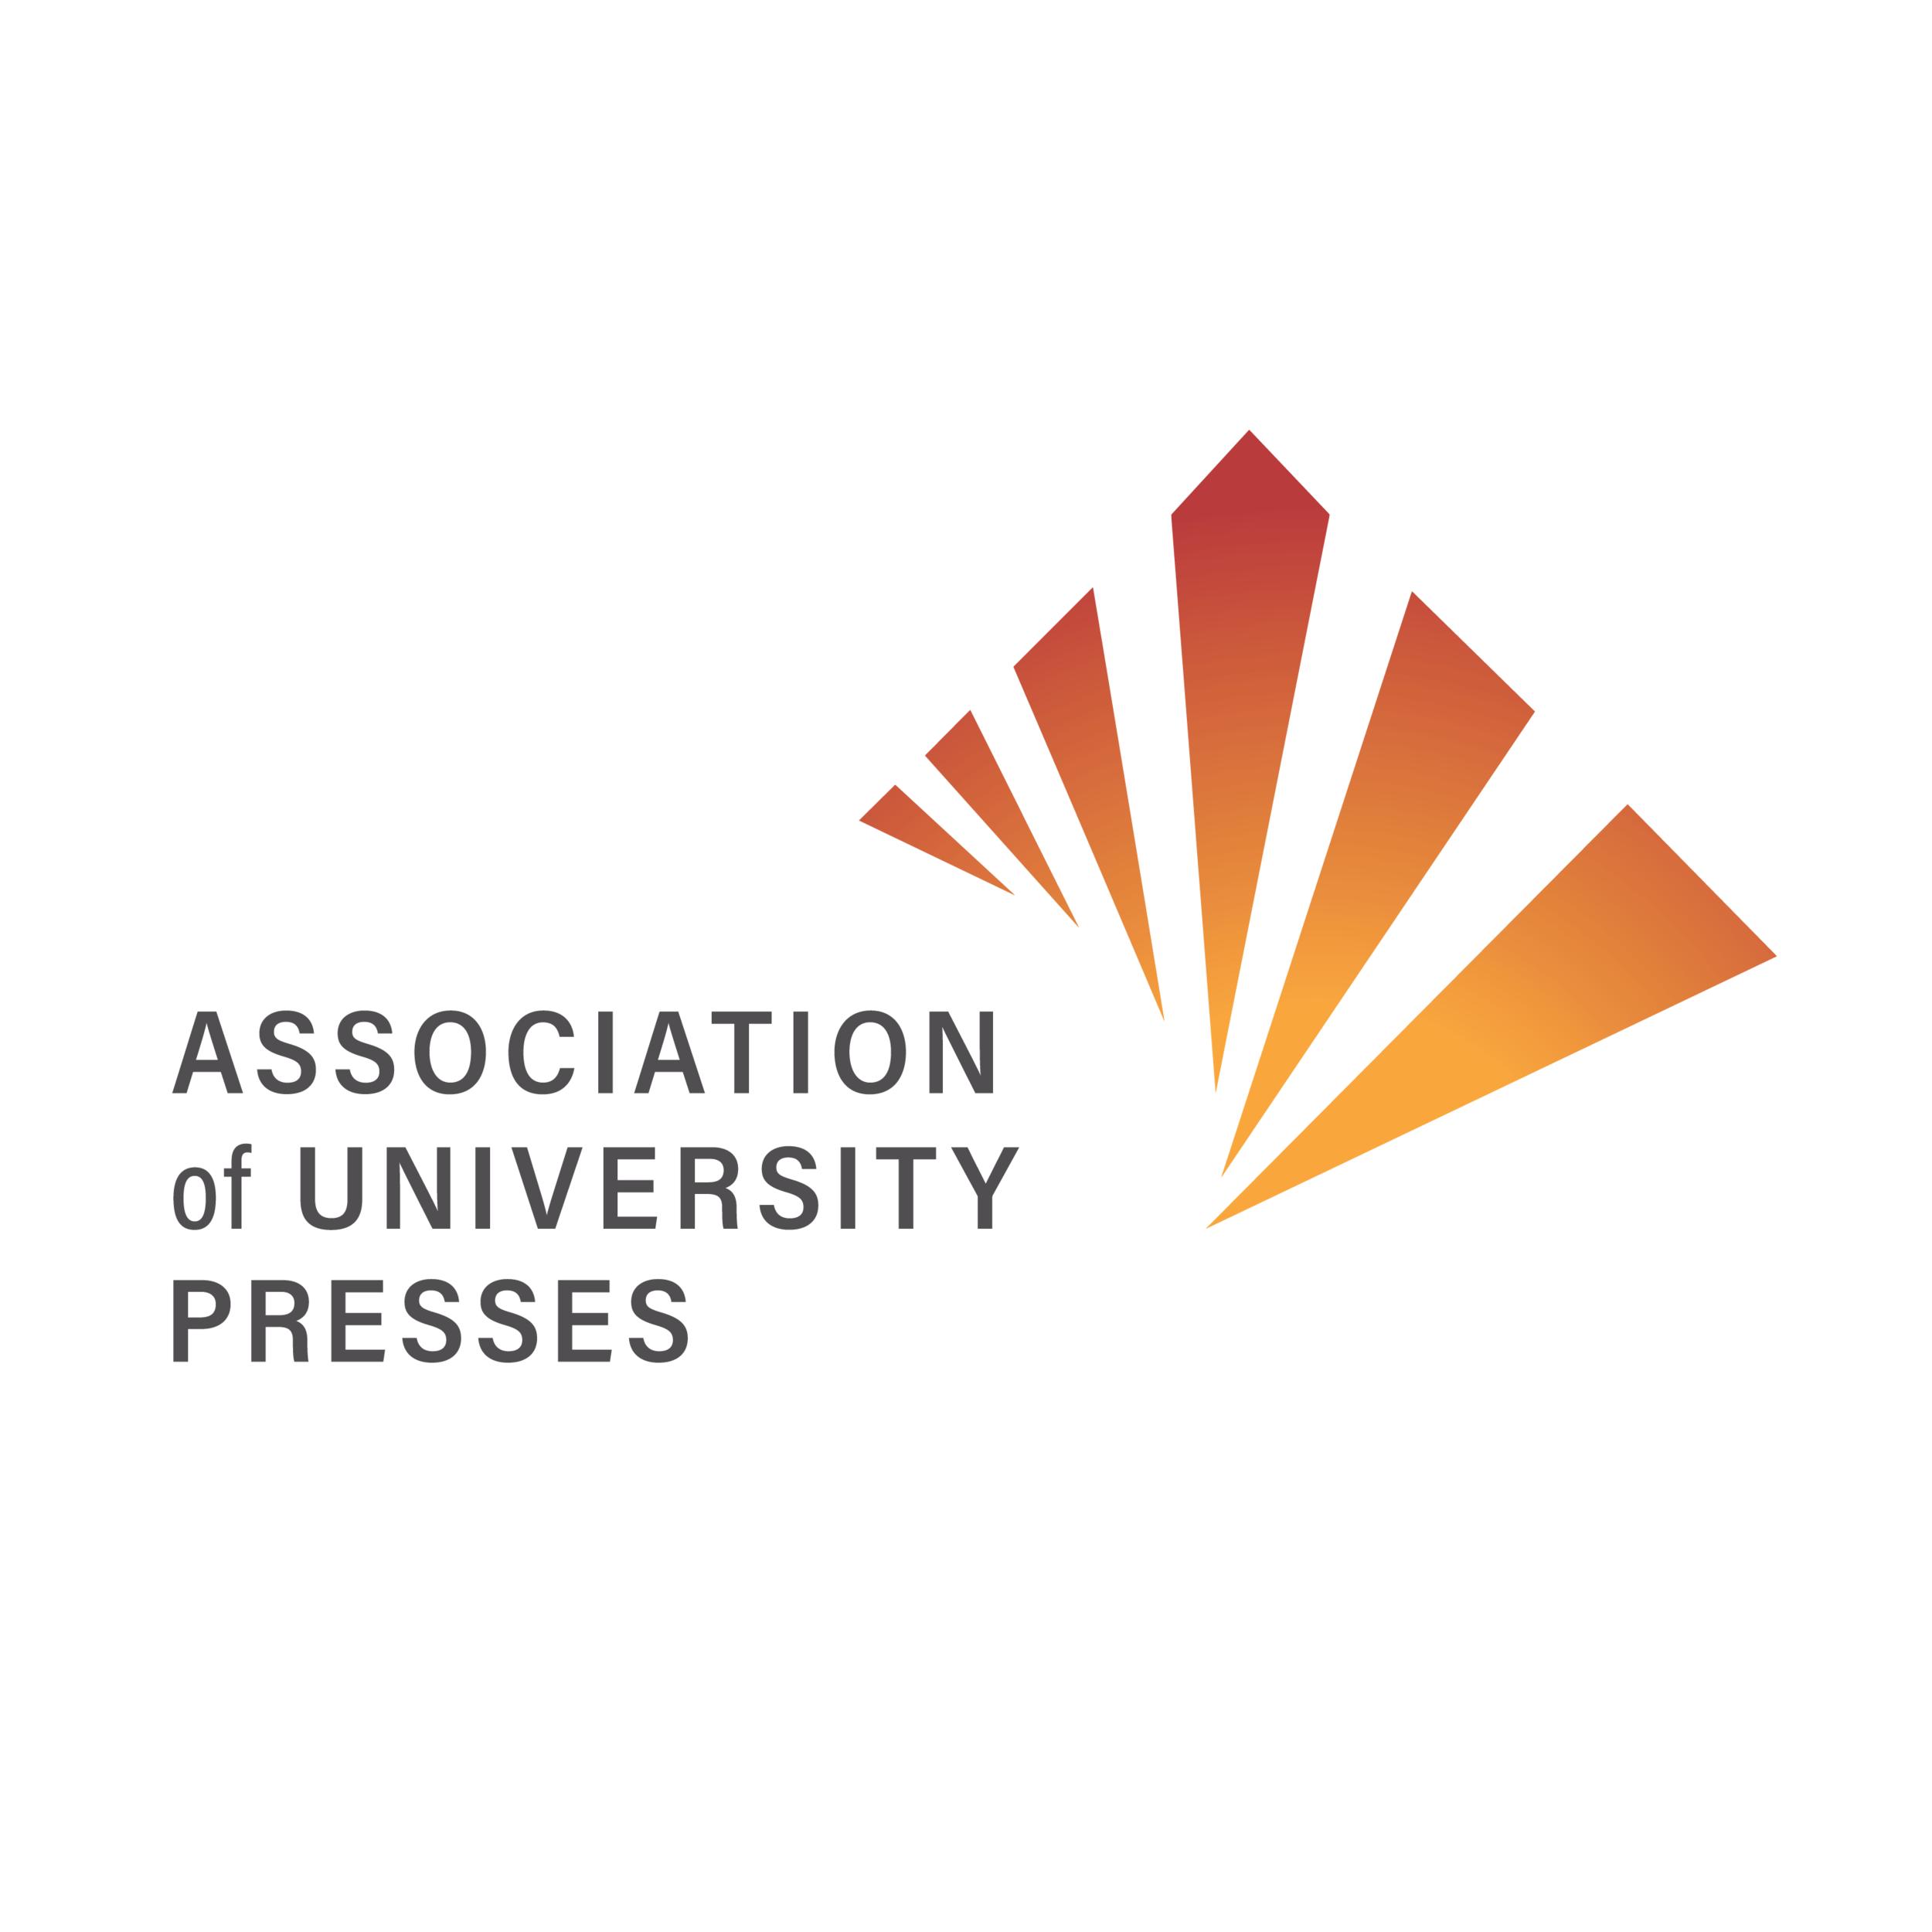 Association of University Presses Rebrand